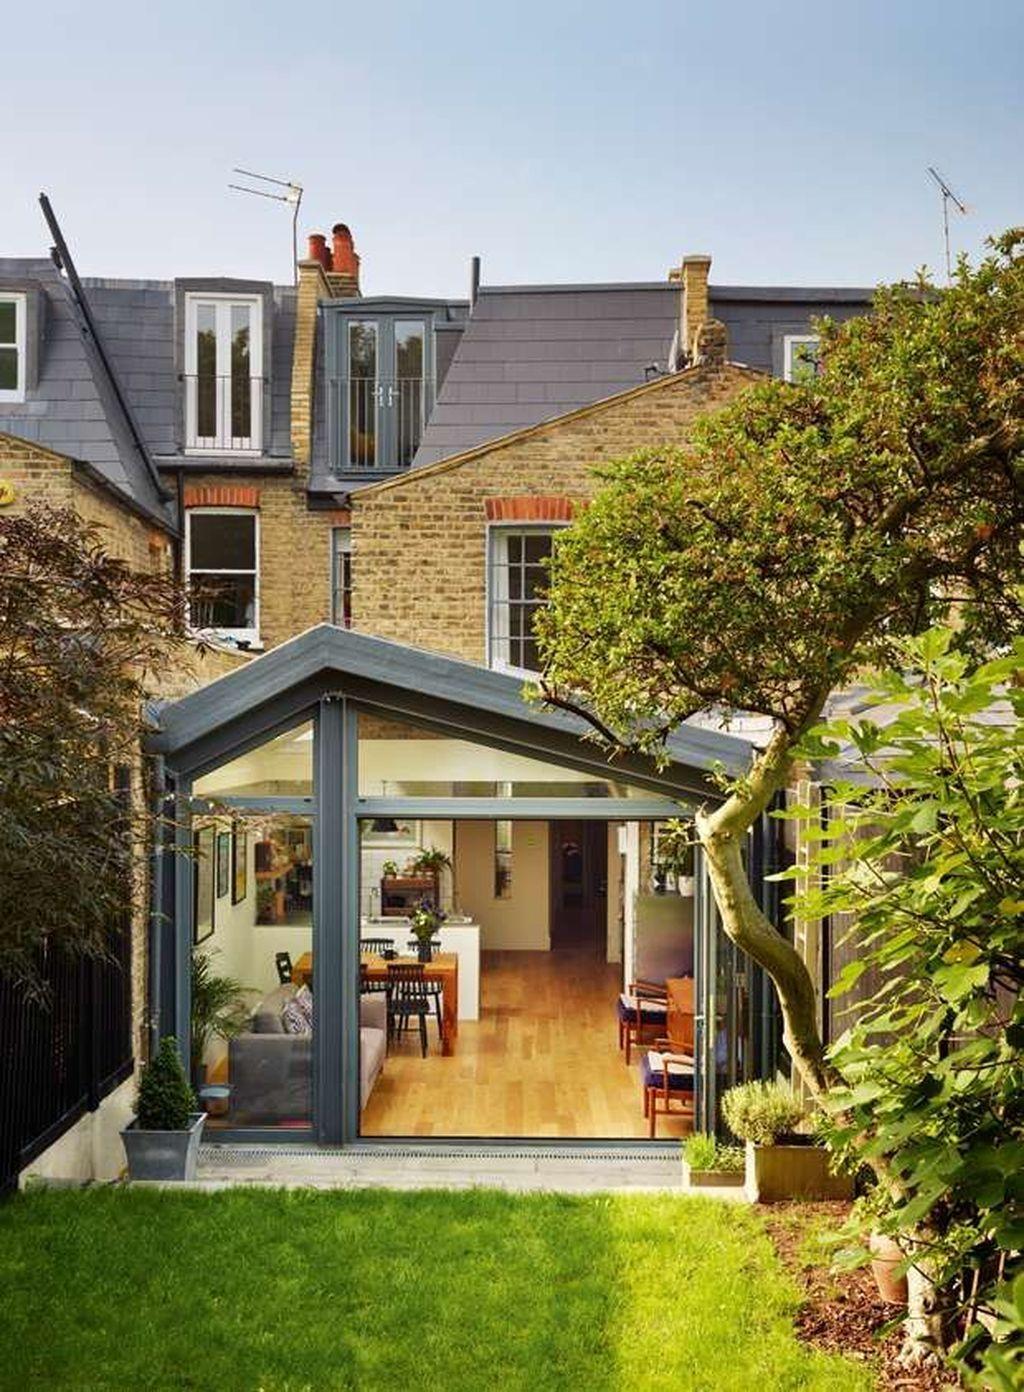 42 Awesome Terrace House Extension Design-Ideen mit offenen Räumen   – Exterior Design